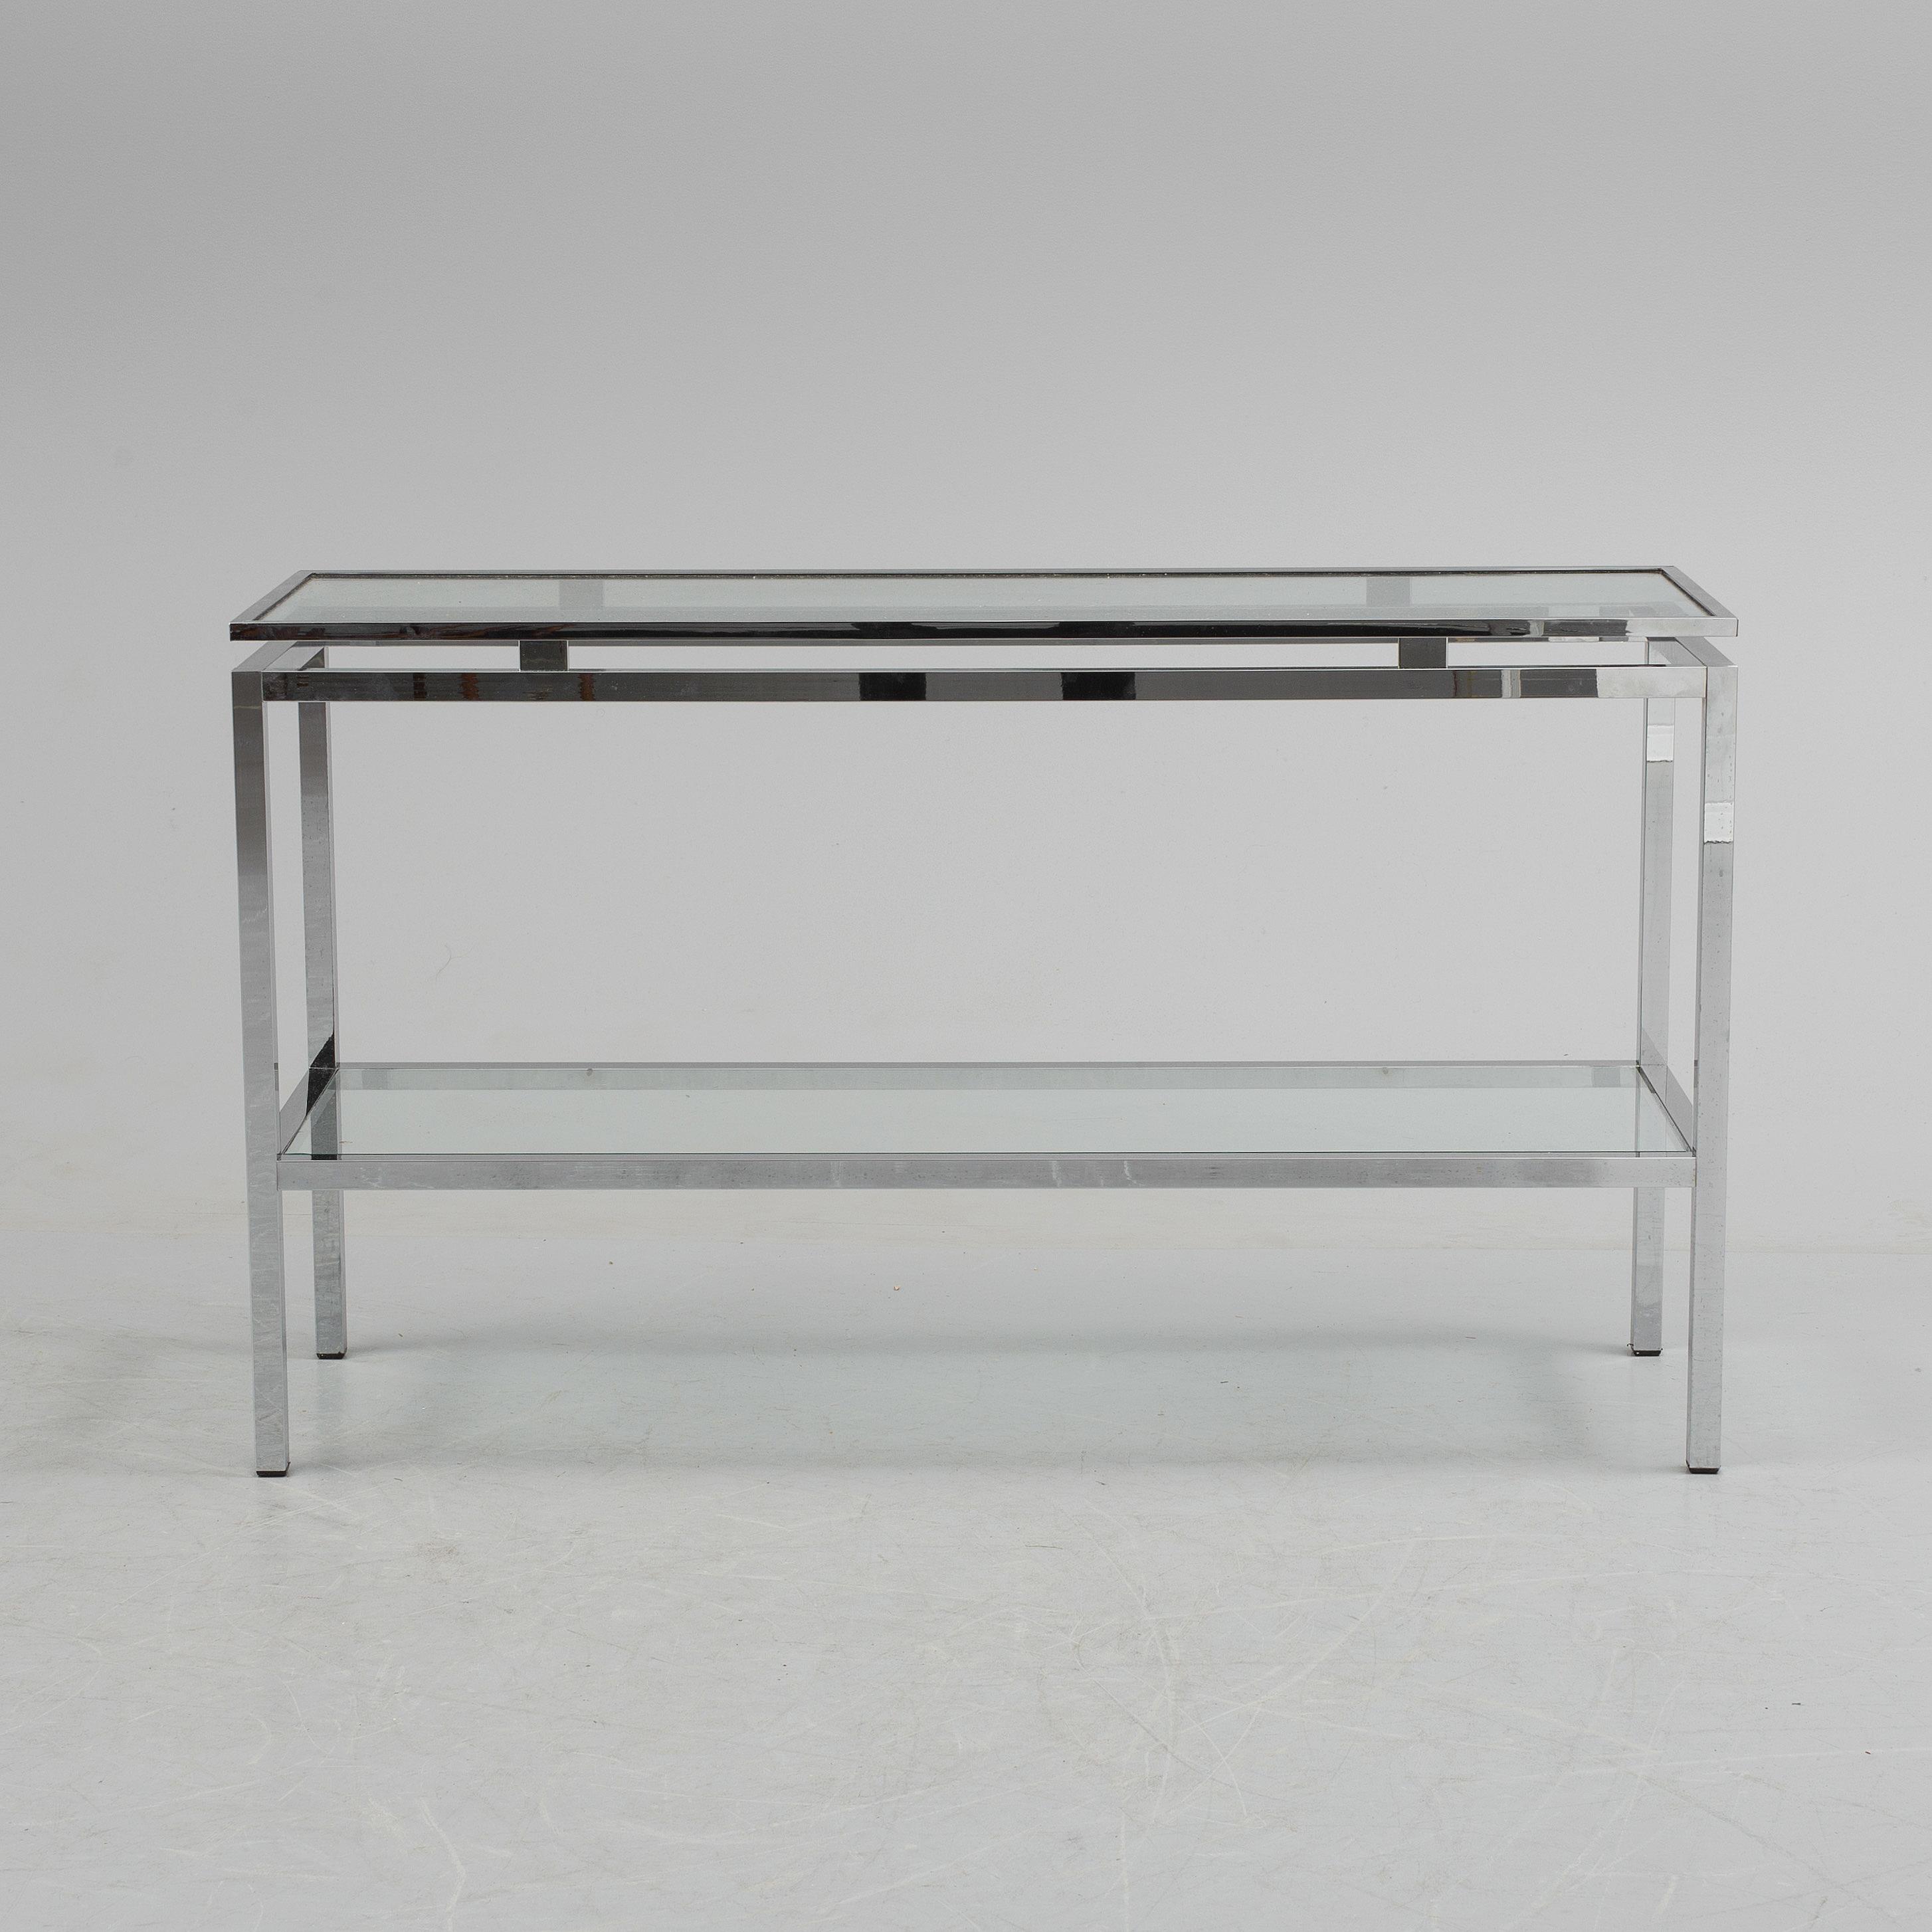 sideboard metall och glas troligen italien 1970 80 tal. Black Bedroom Furniture Sets. Home Design Ideas